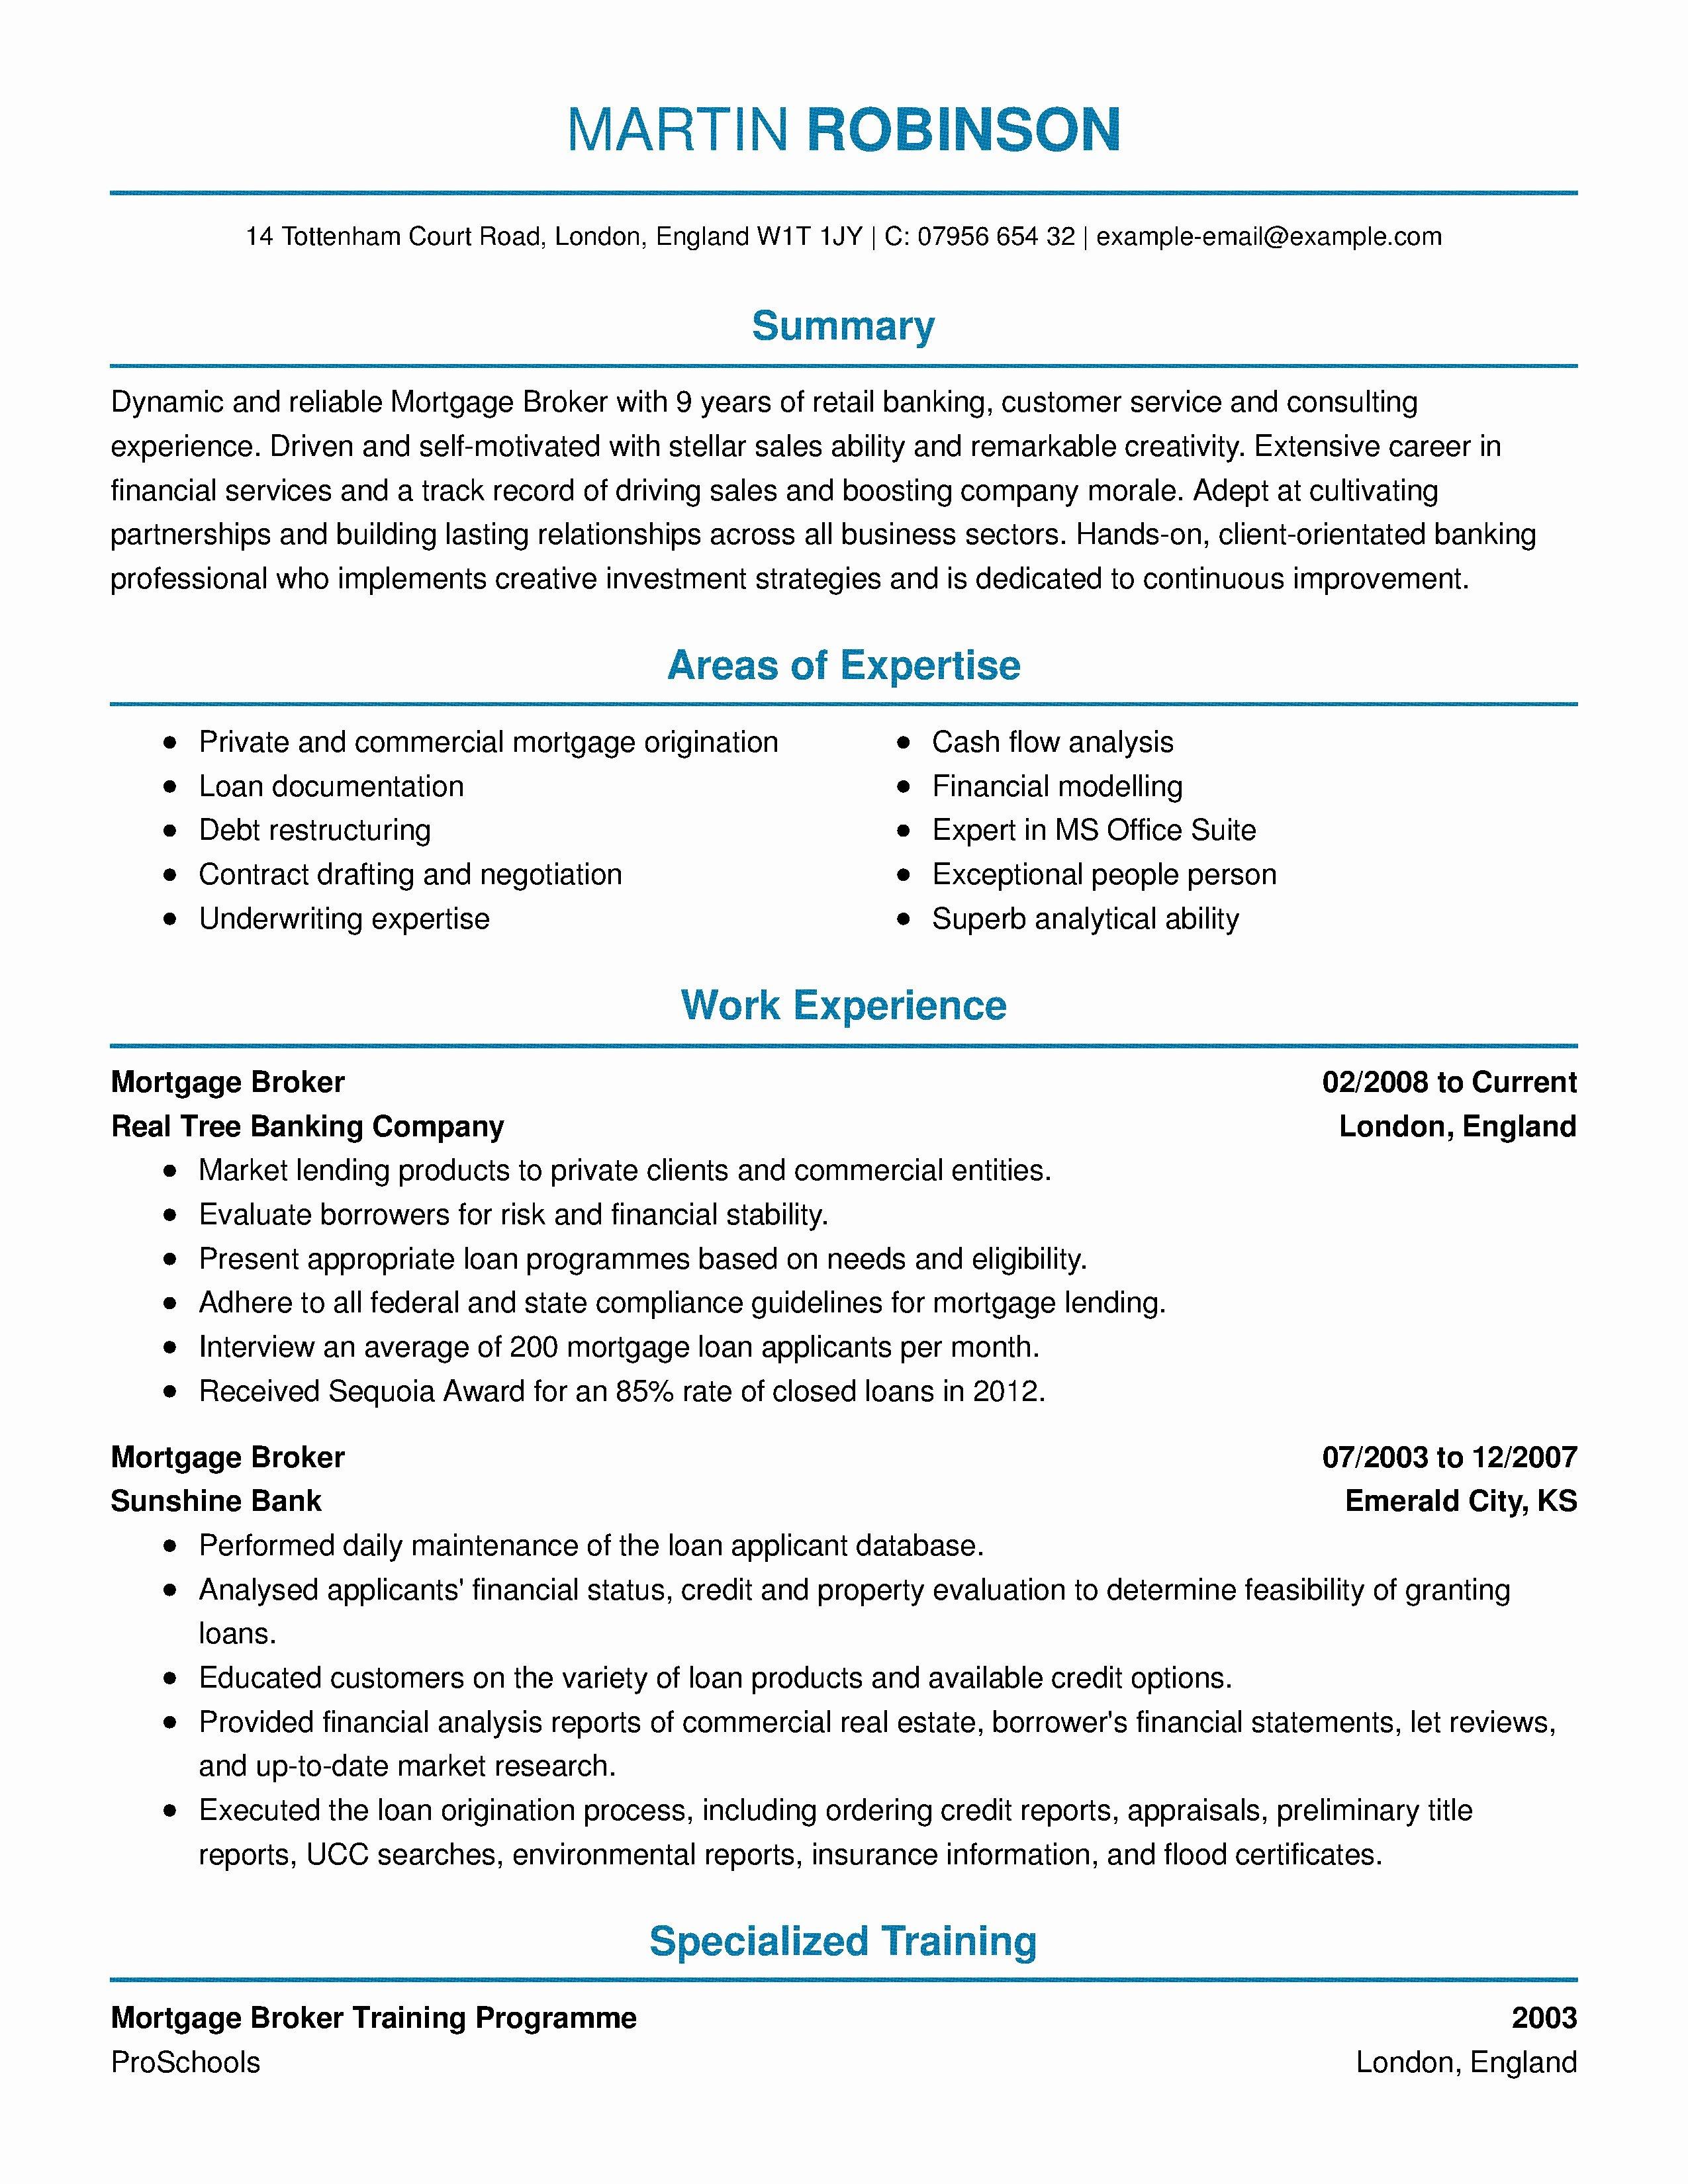 20 Business Valuation Report Template Worksheet – Guiaubuntupt For Business Valuation Report Template Worksheet